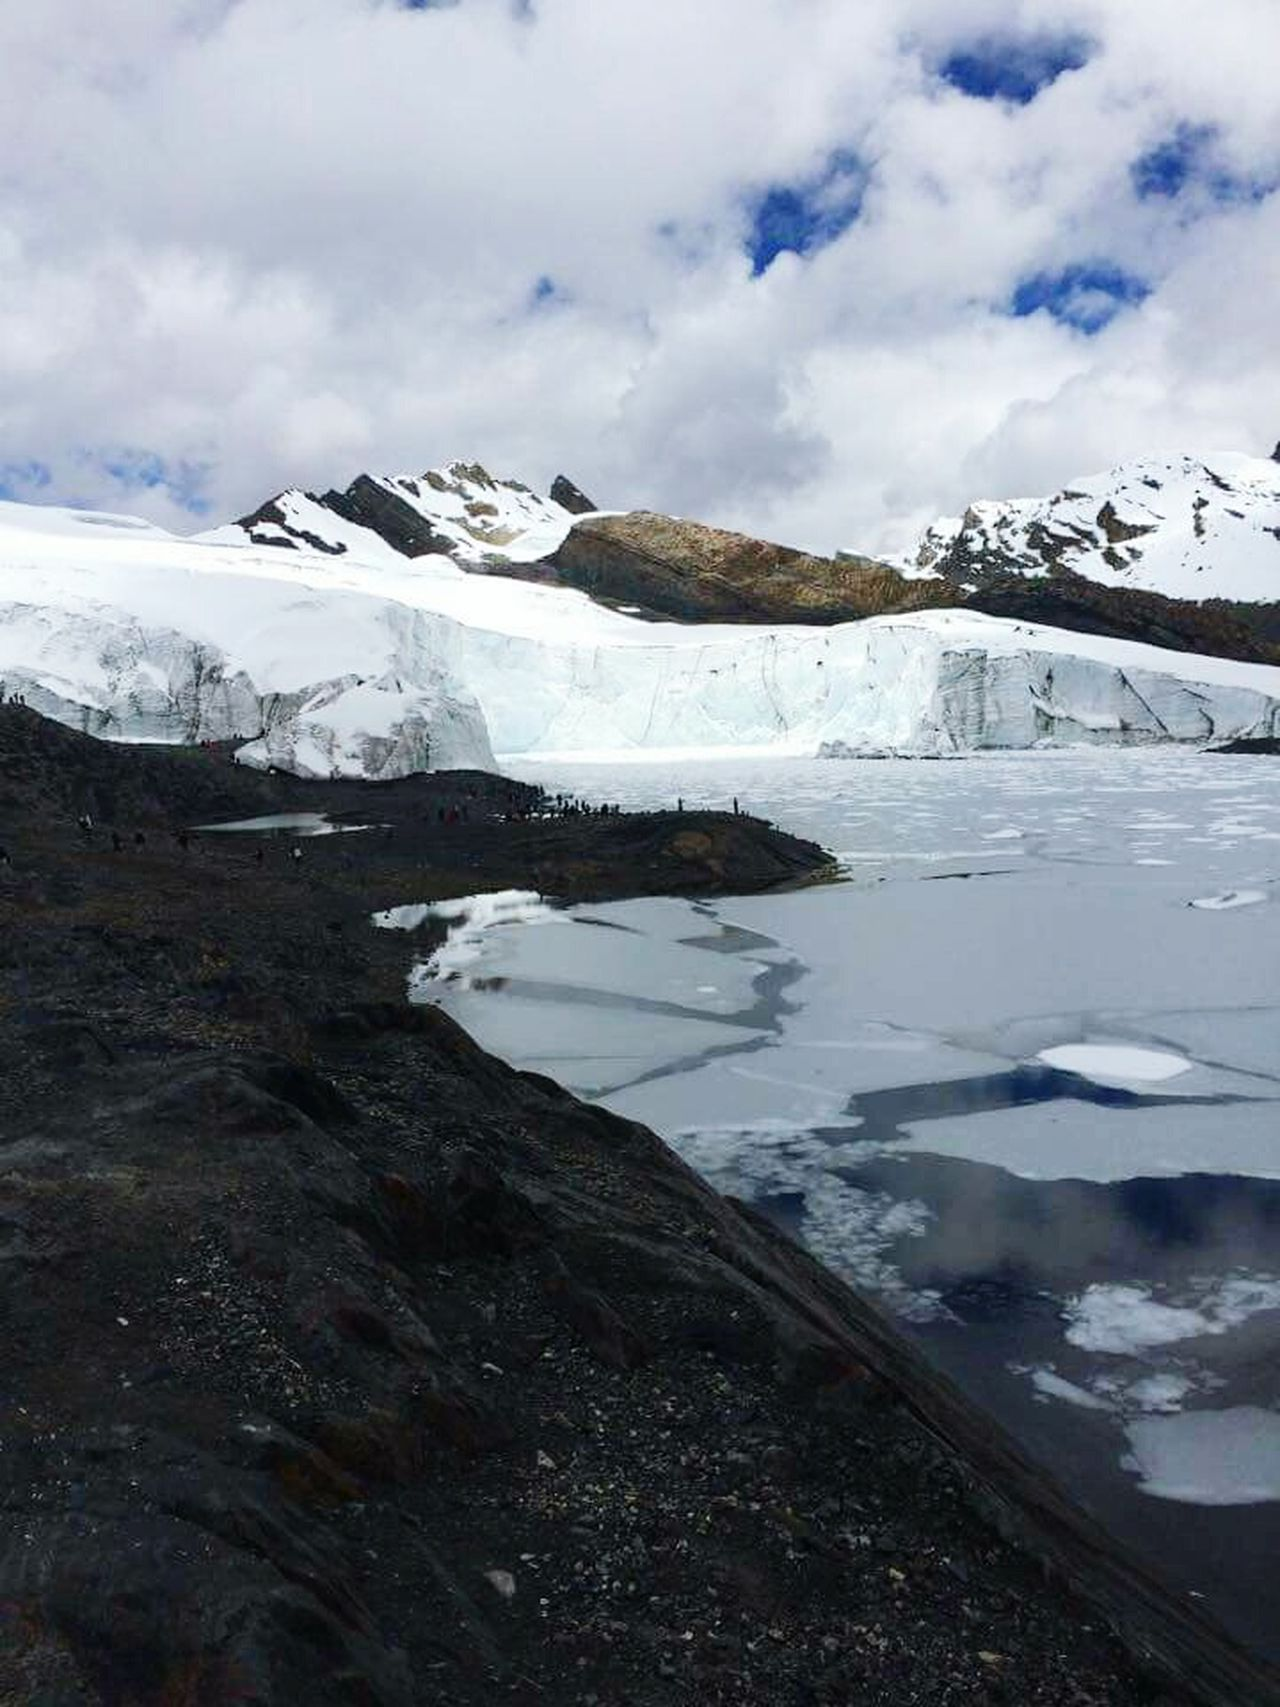 Iceberg Pastouri Peru 2015  Cordillera De Los Andes High Altitude Andesmountains Cold Air